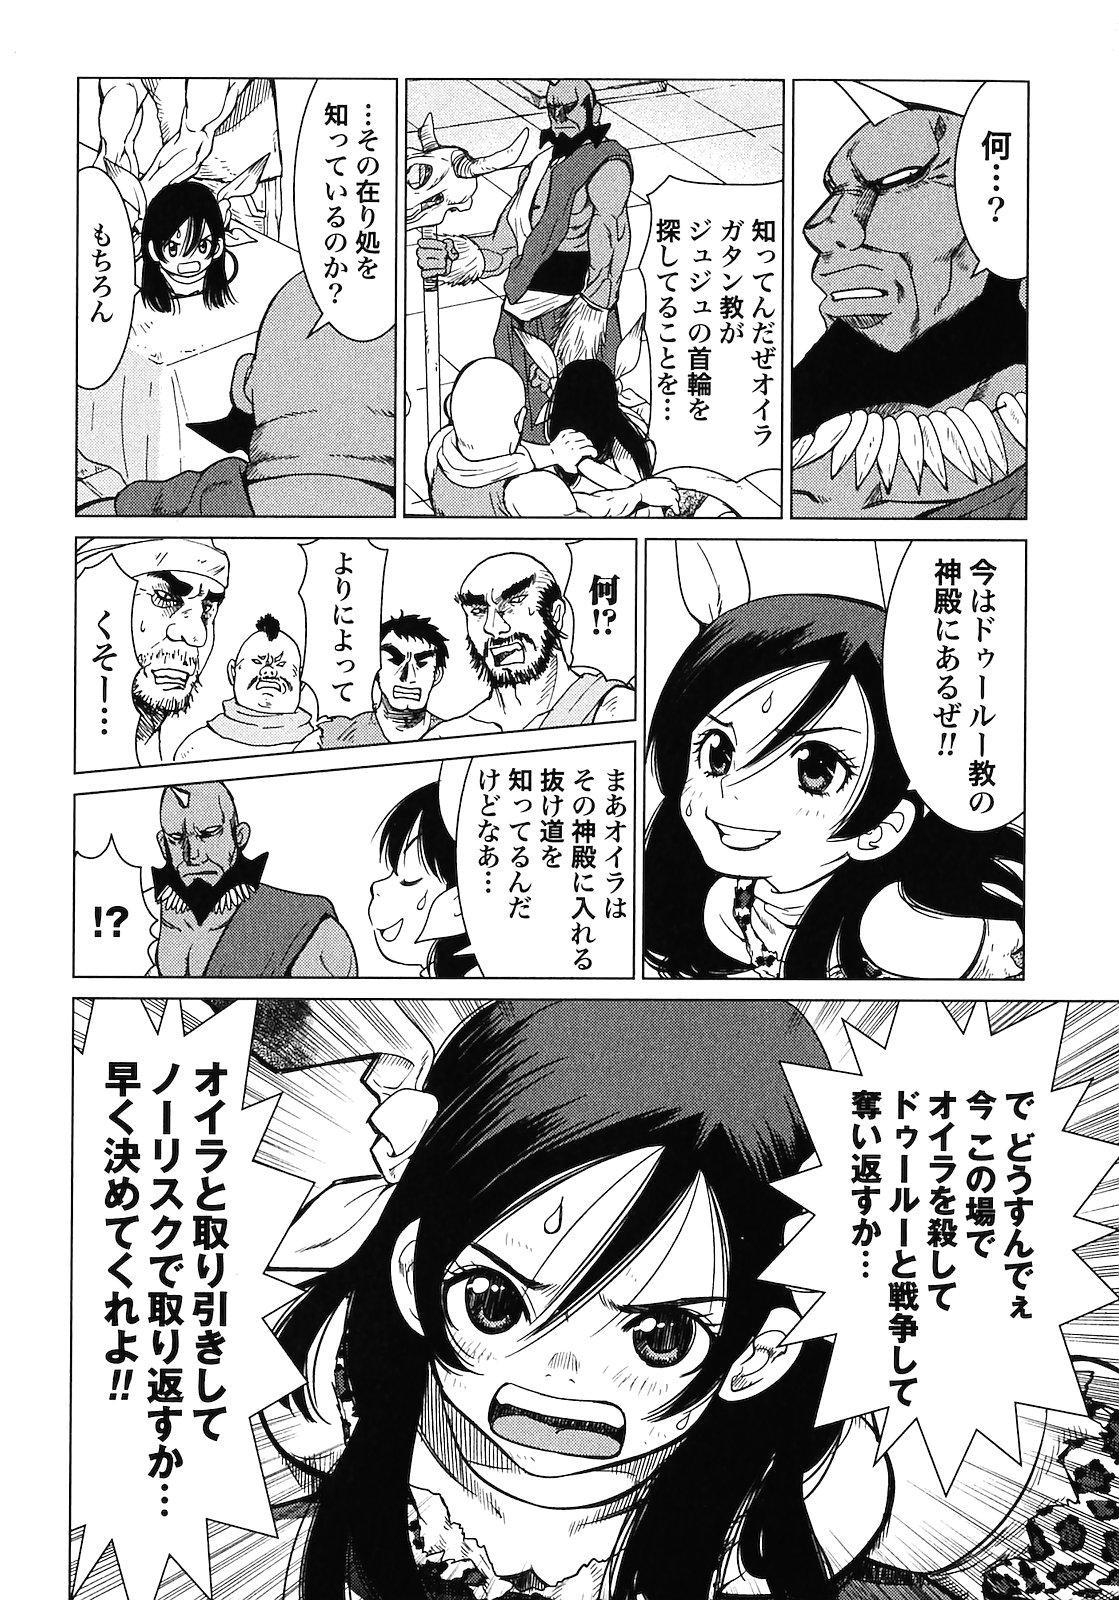 Makyo no Shanana Vol.02 91